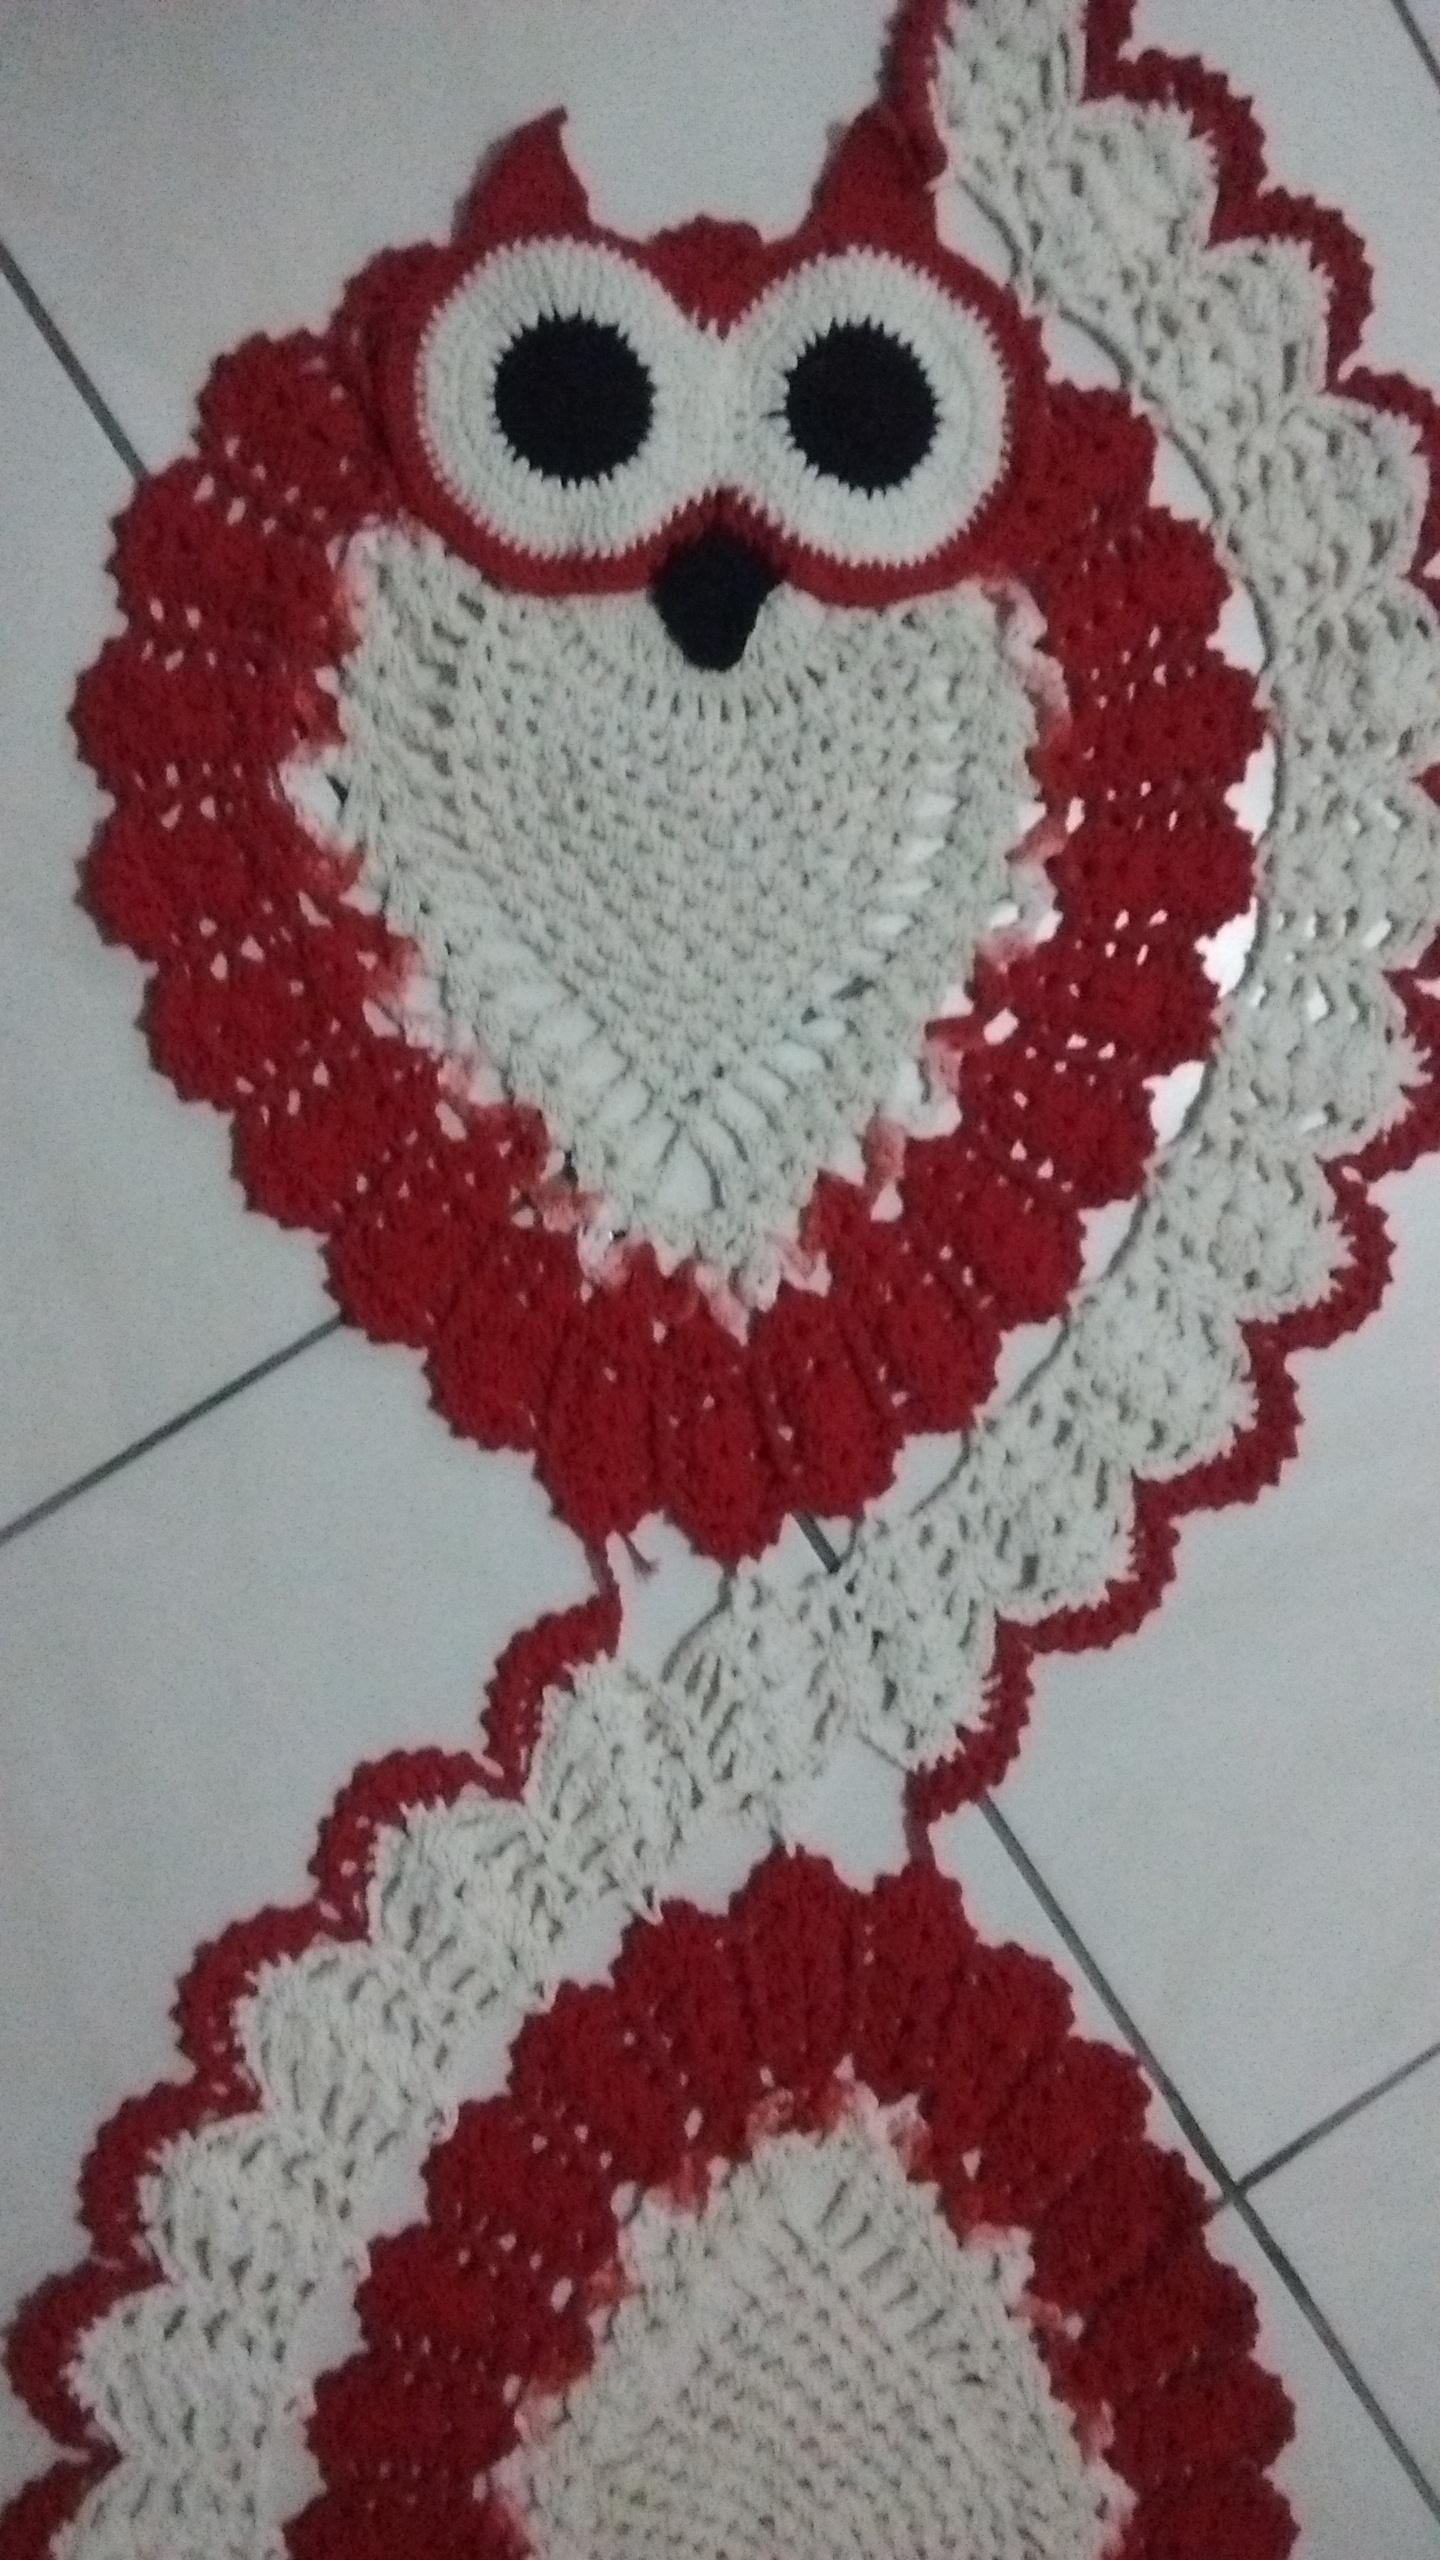 Preferência Passadeira de crochê modelo coruja   CrochêVesguerber   Elo7 PF34